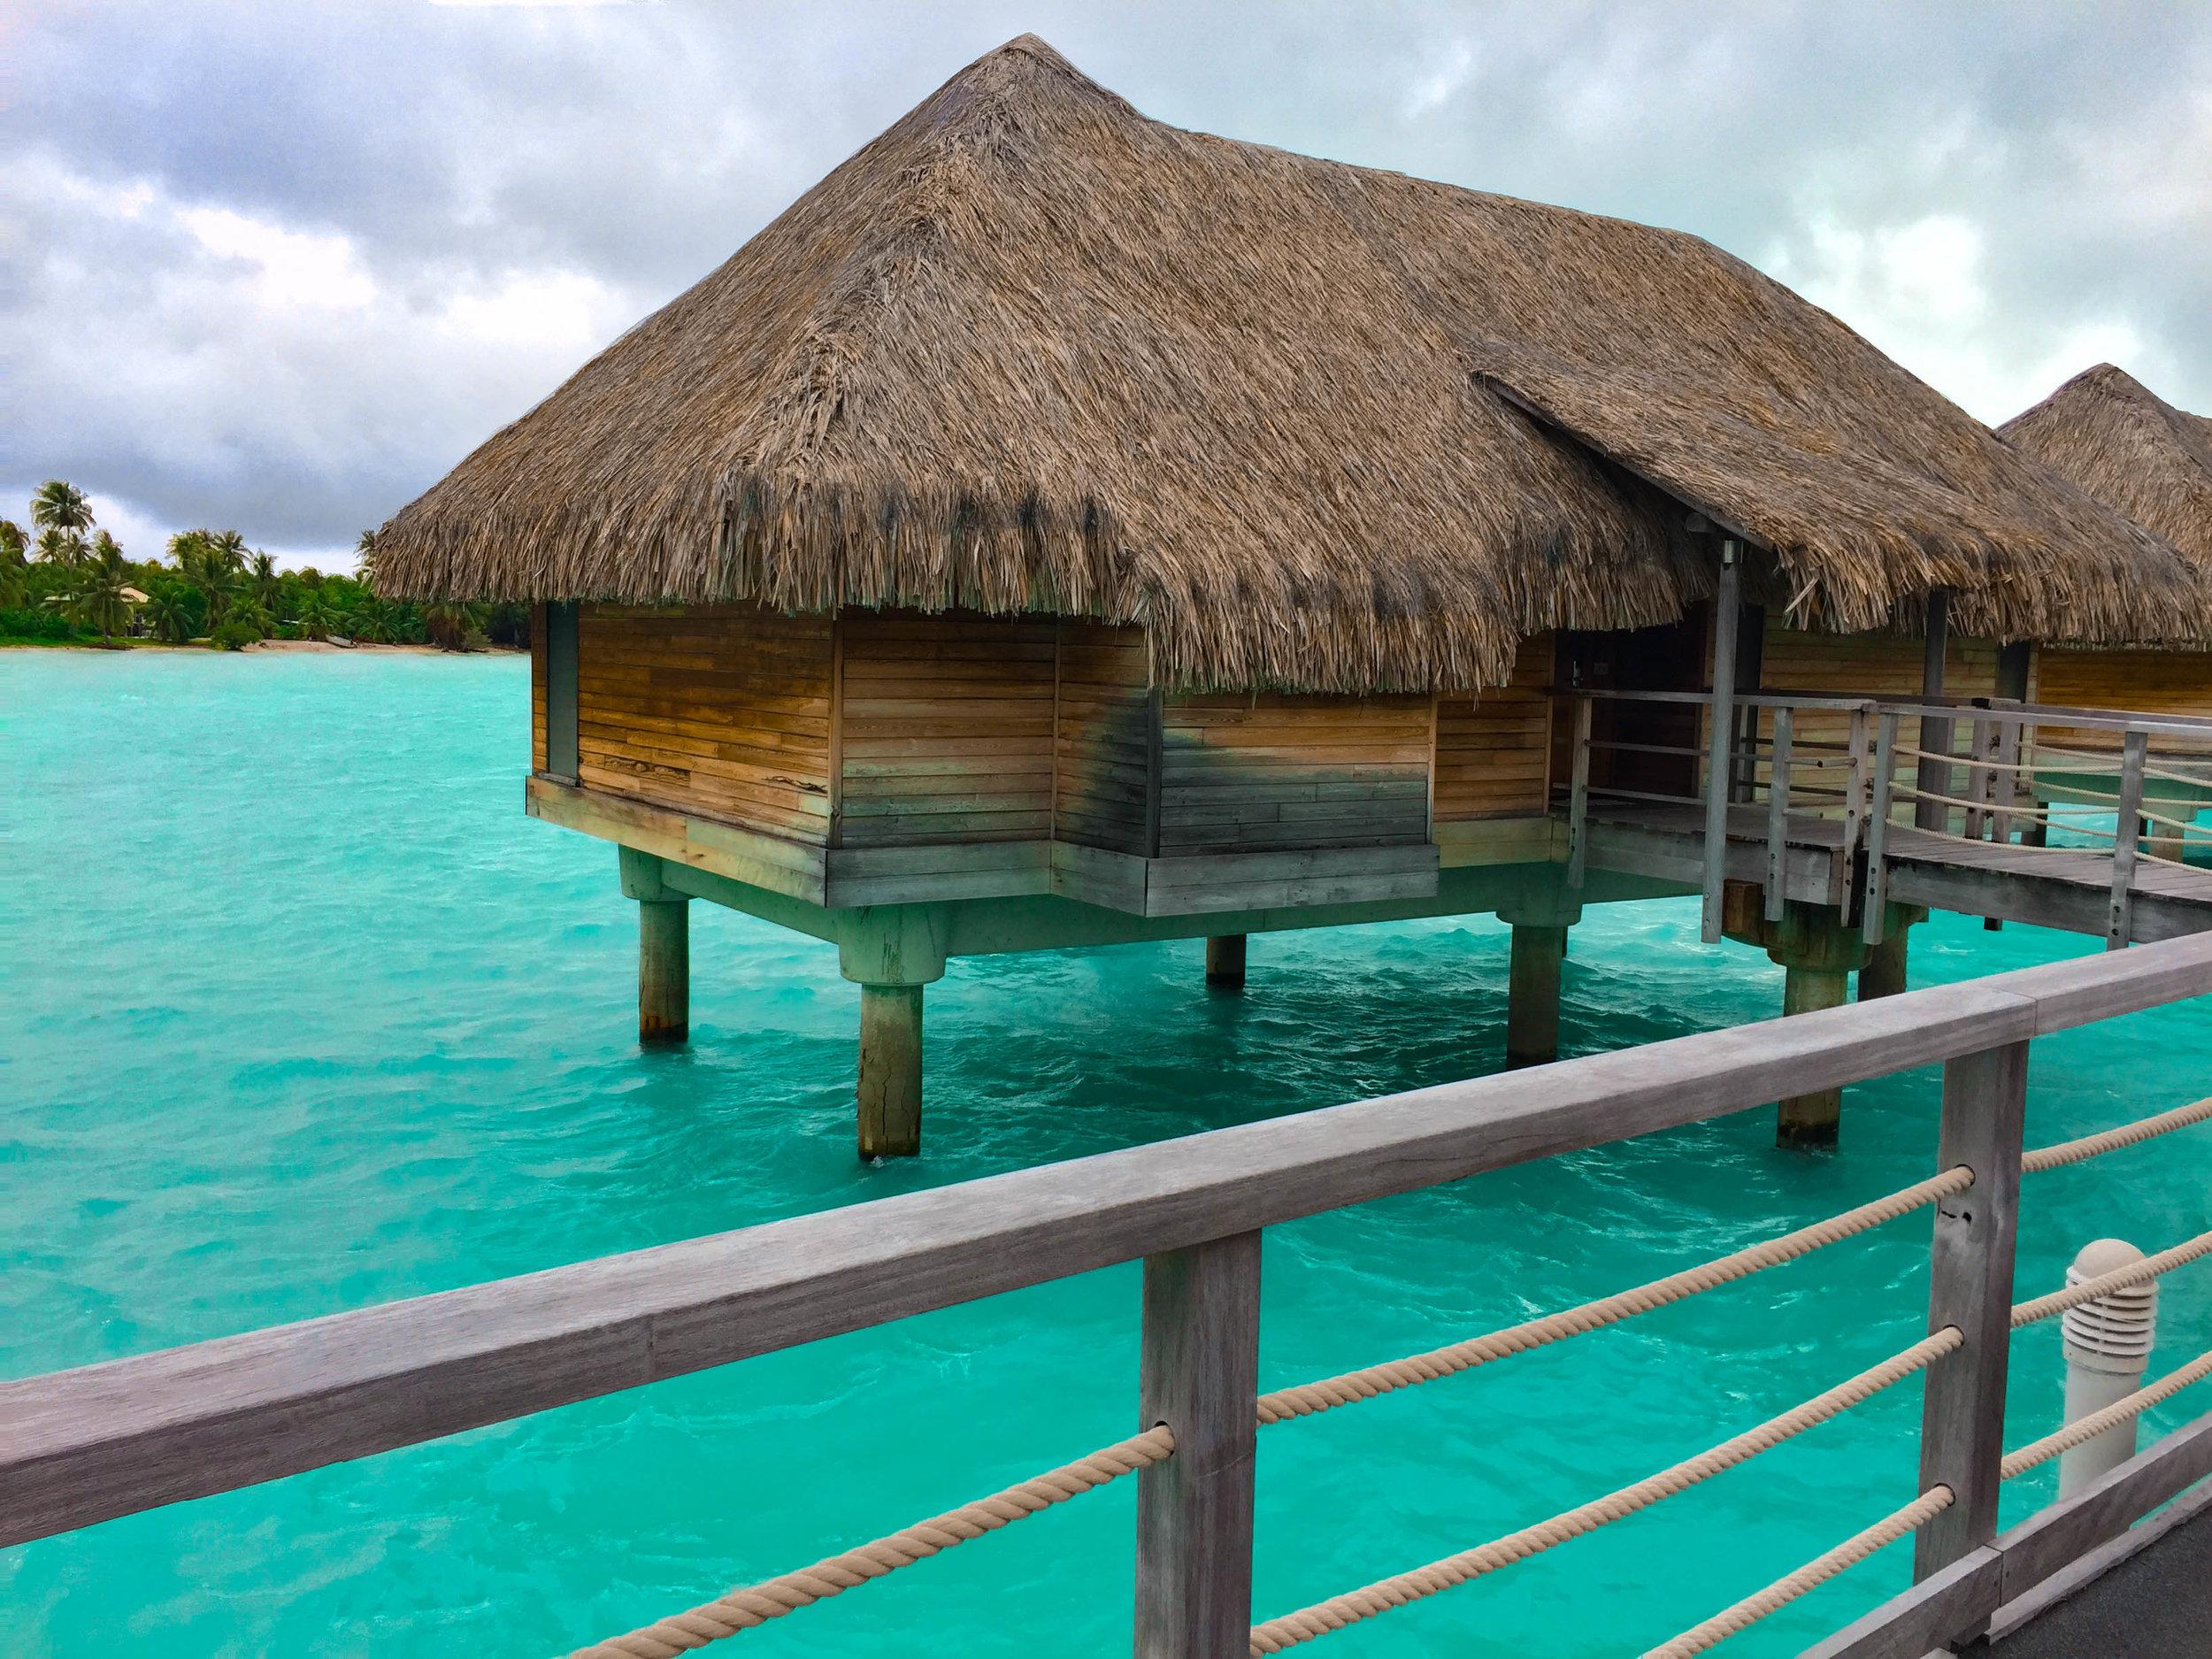 Bora_Bora_InterContinental_hotel_overwater_bungalow.jpg